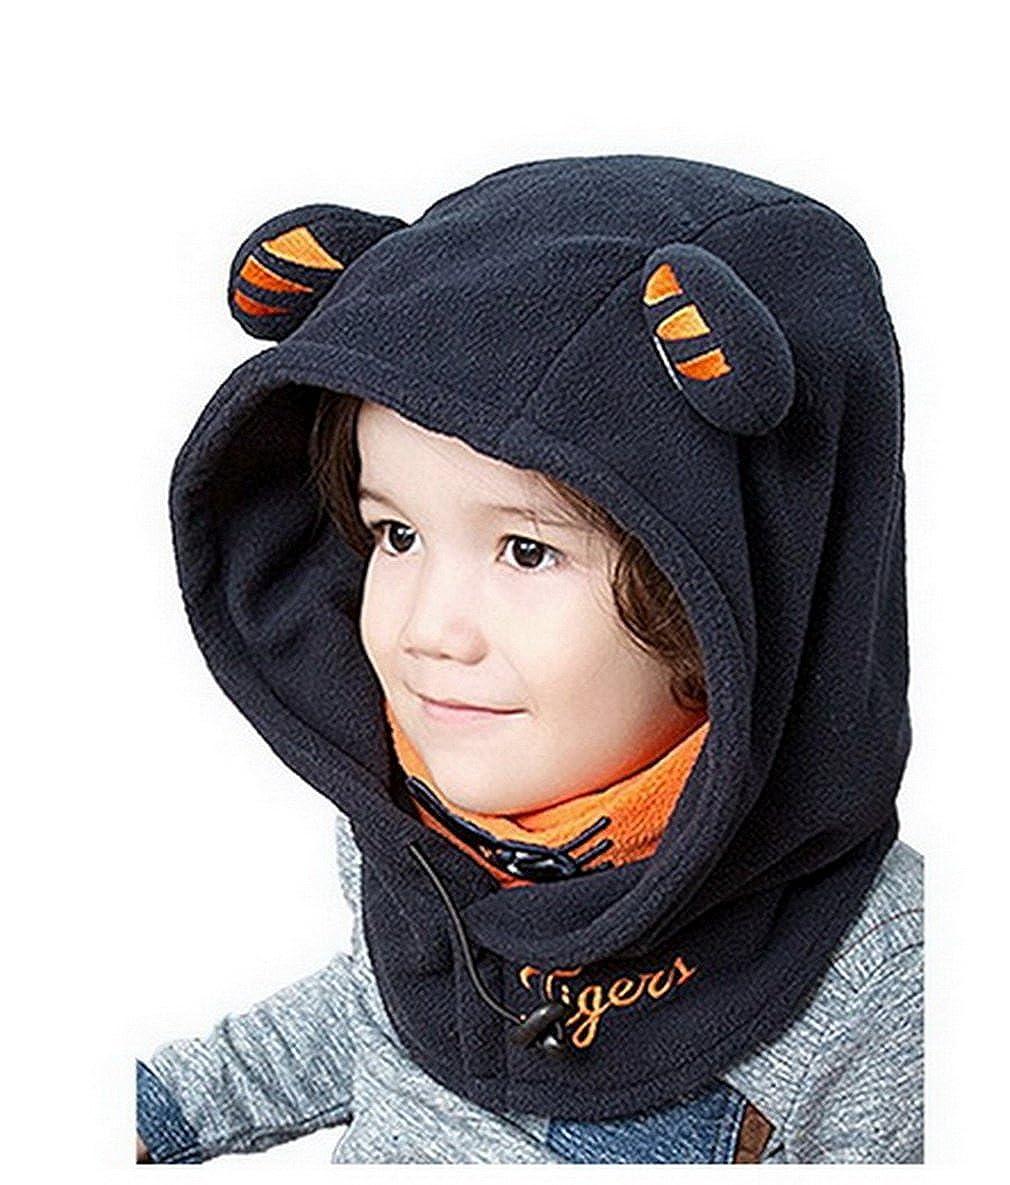 Bigood Children's Winter Thick Warm Windproof Cap Adjustable Face Cover Ski Hat